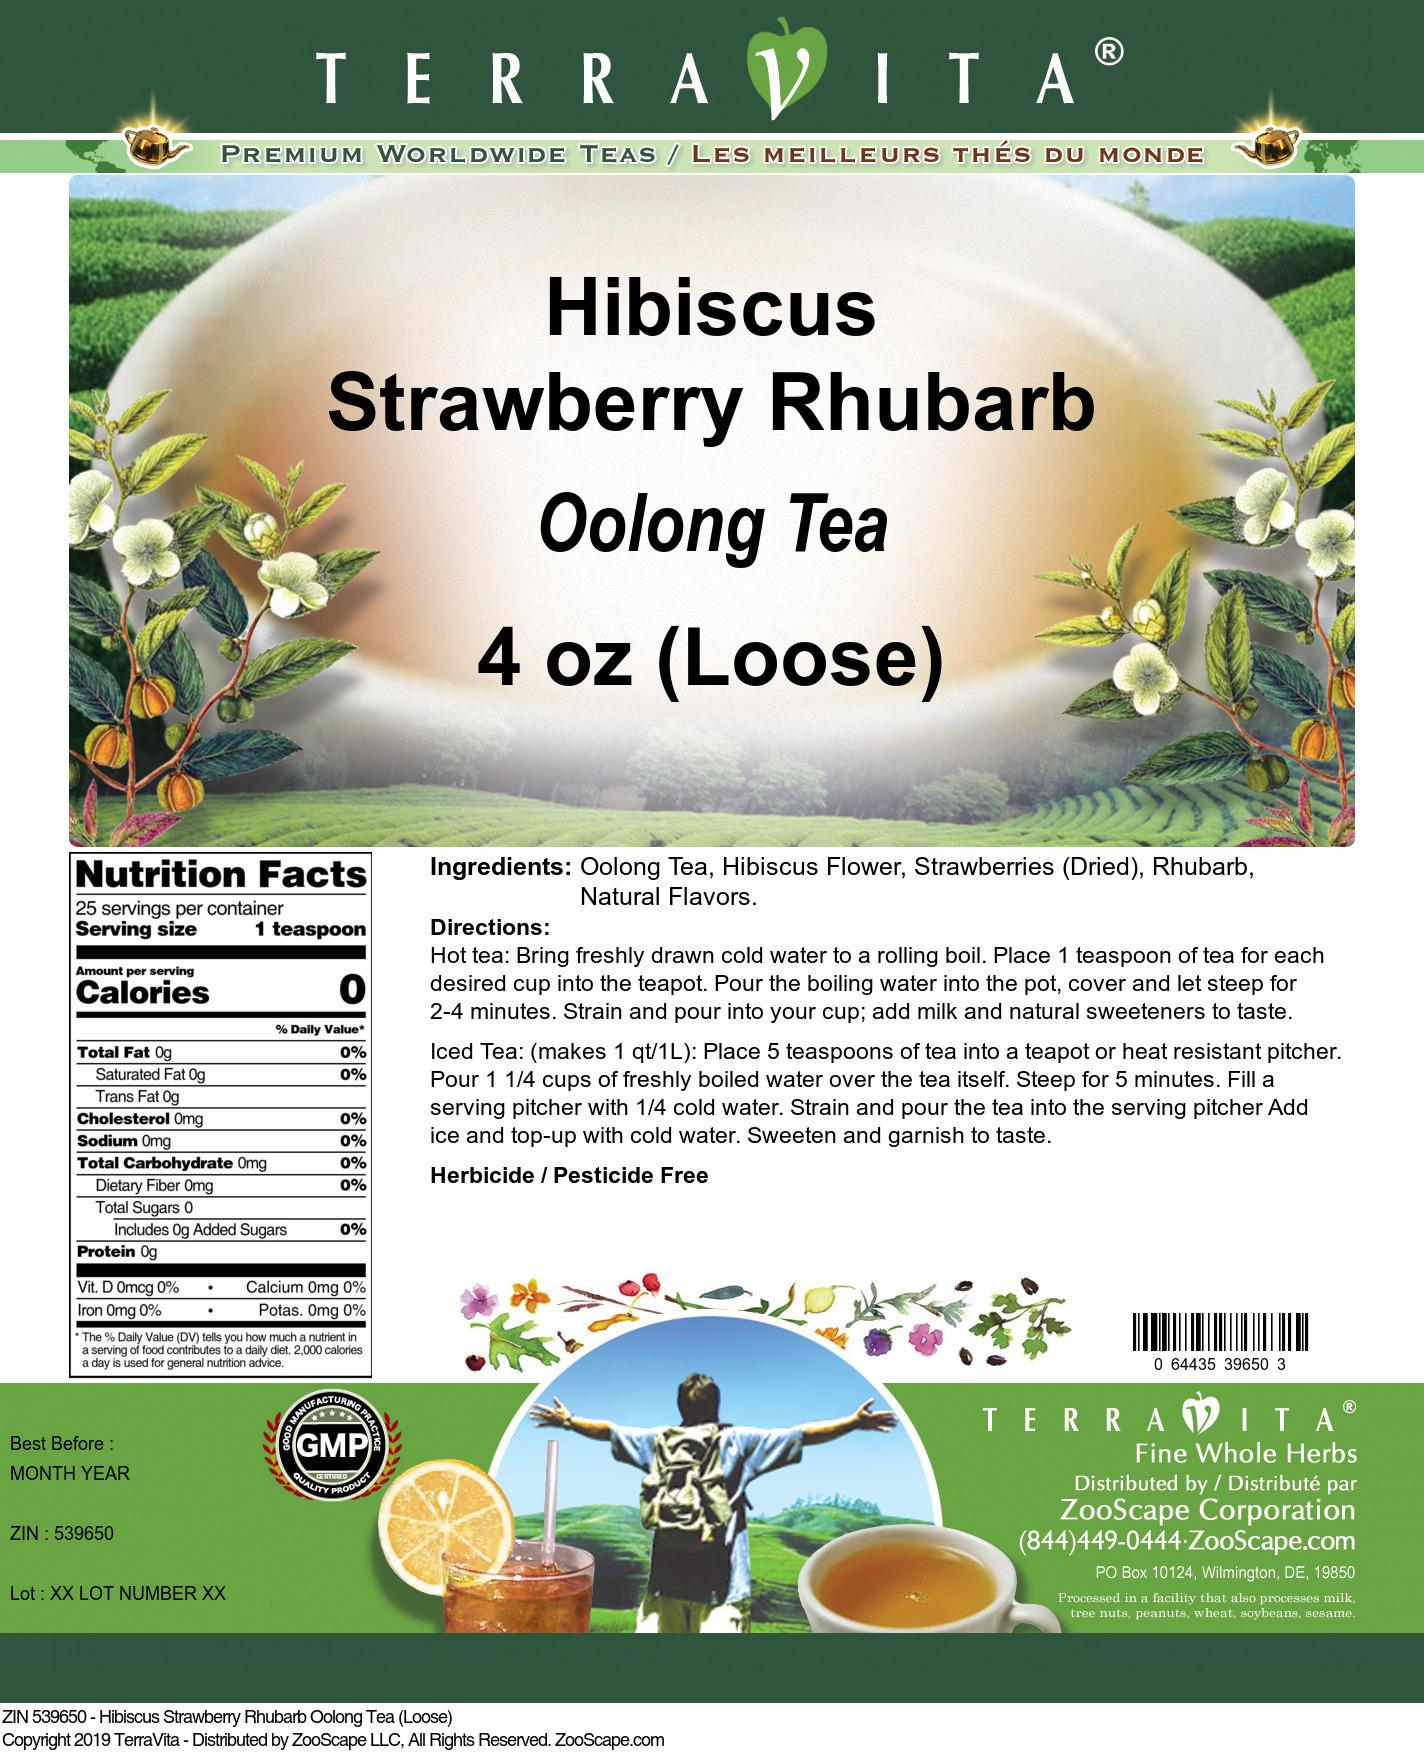 Hibiscus Strawberry Rhubarb Oolong Tea (Loose)